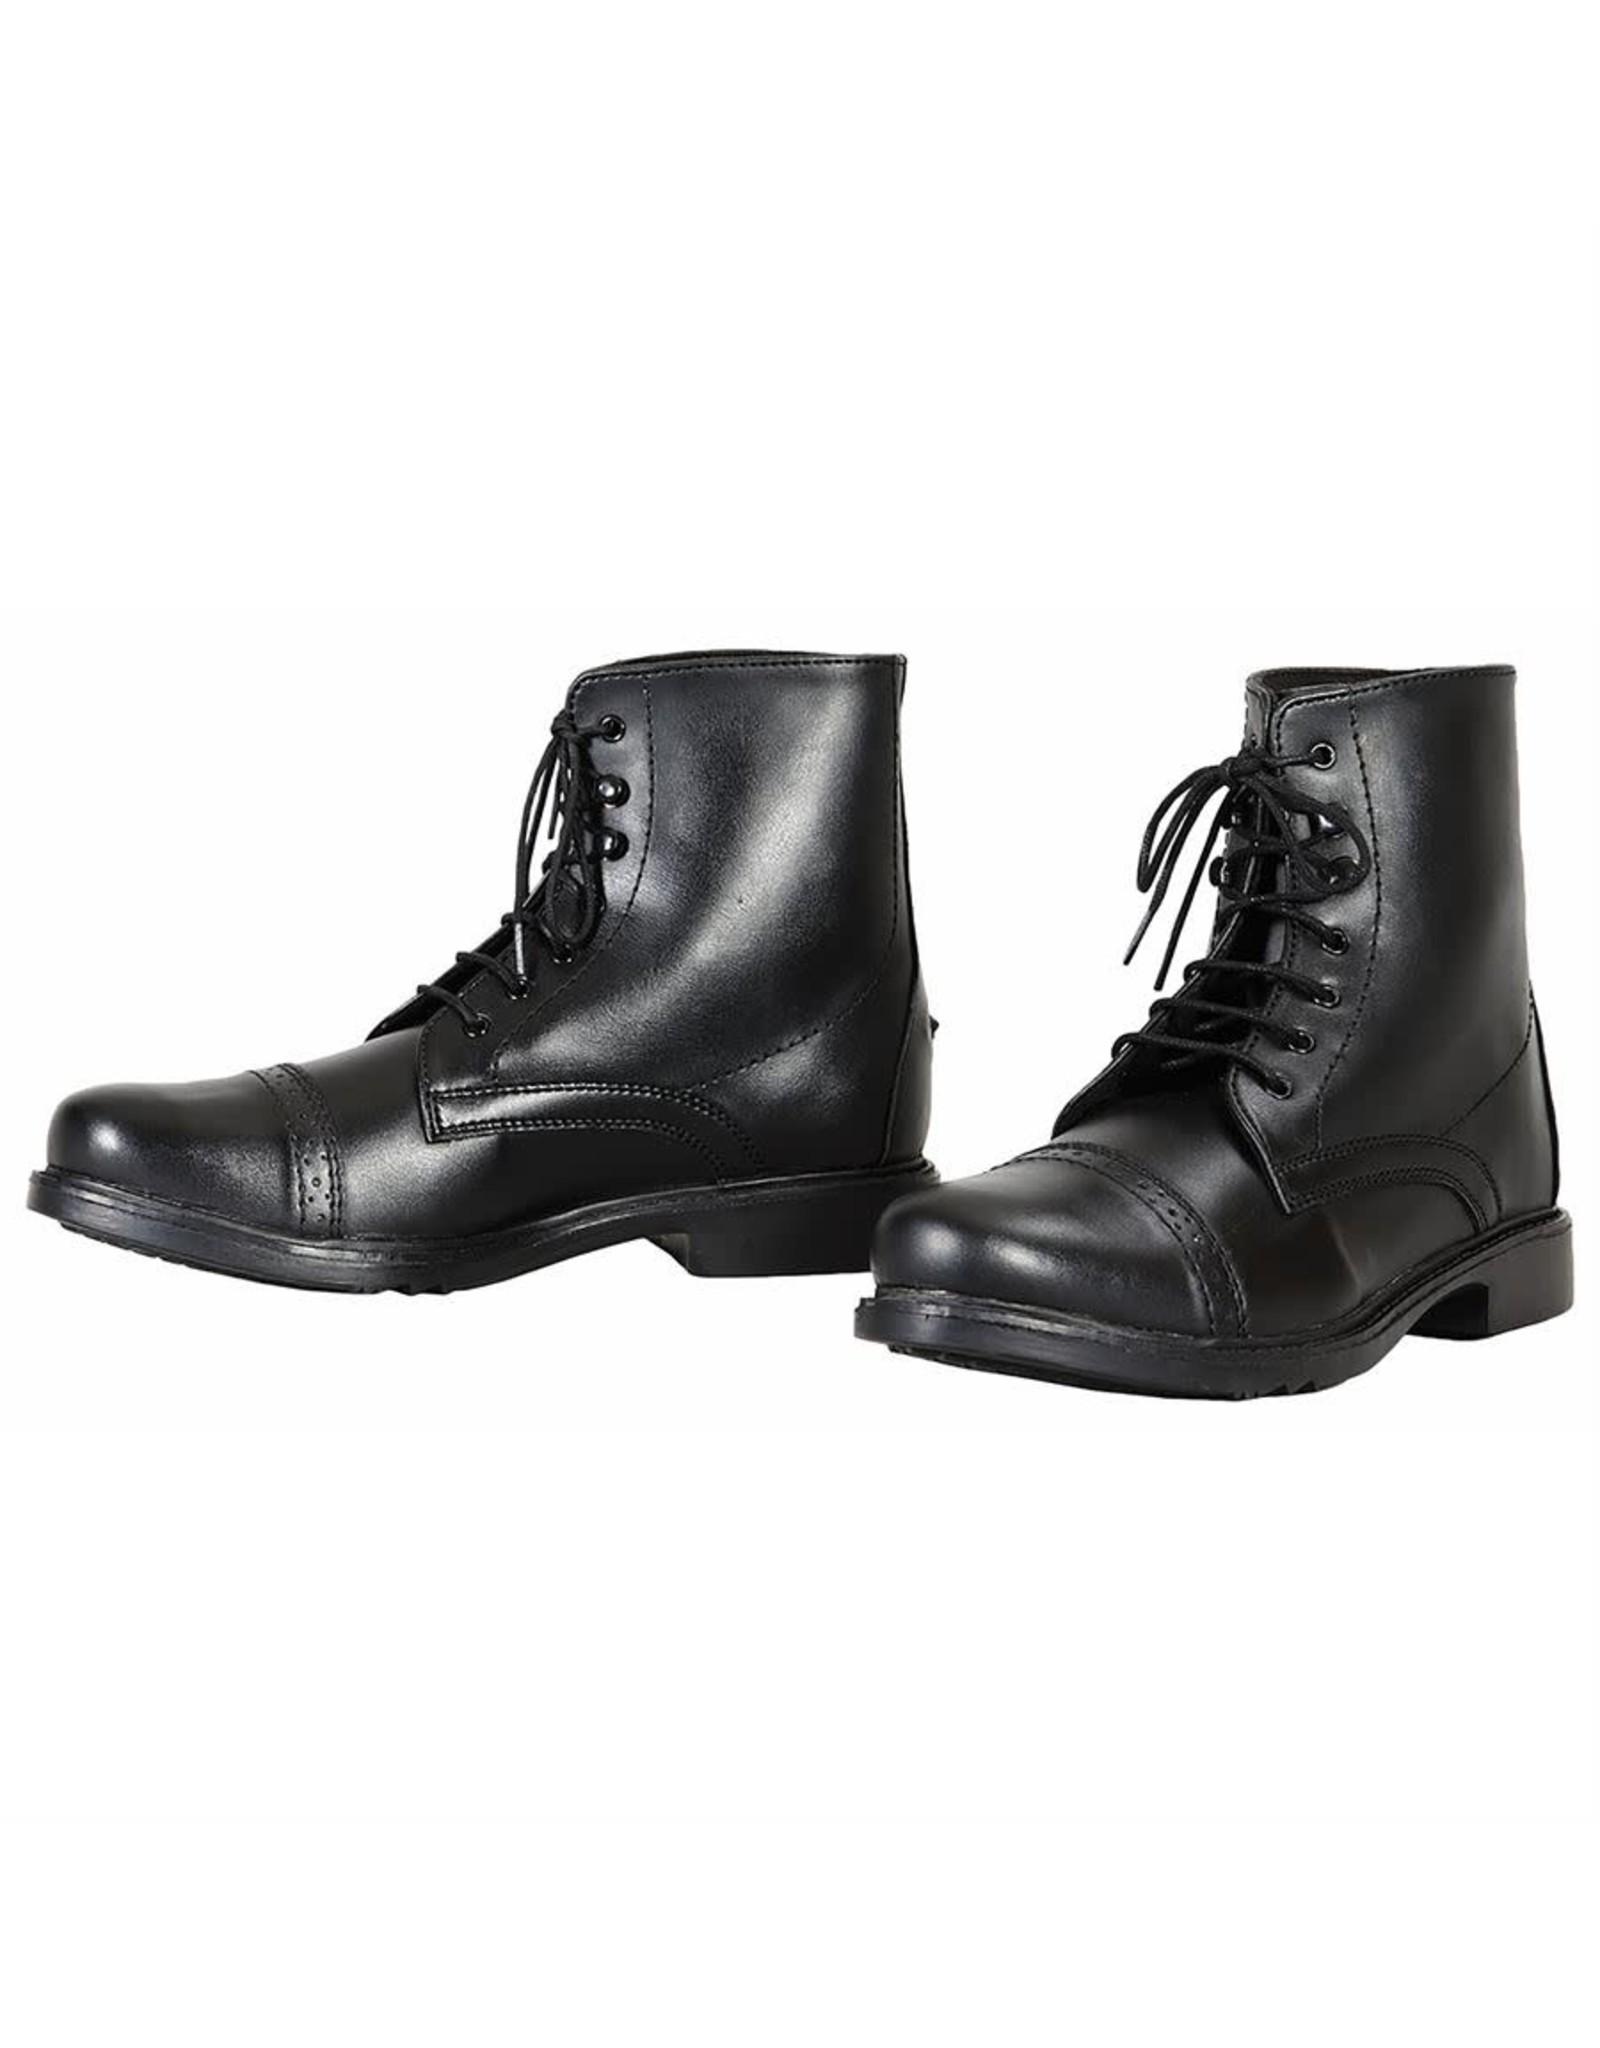 Tuffrider Starter Paddock Boot Lace Adult